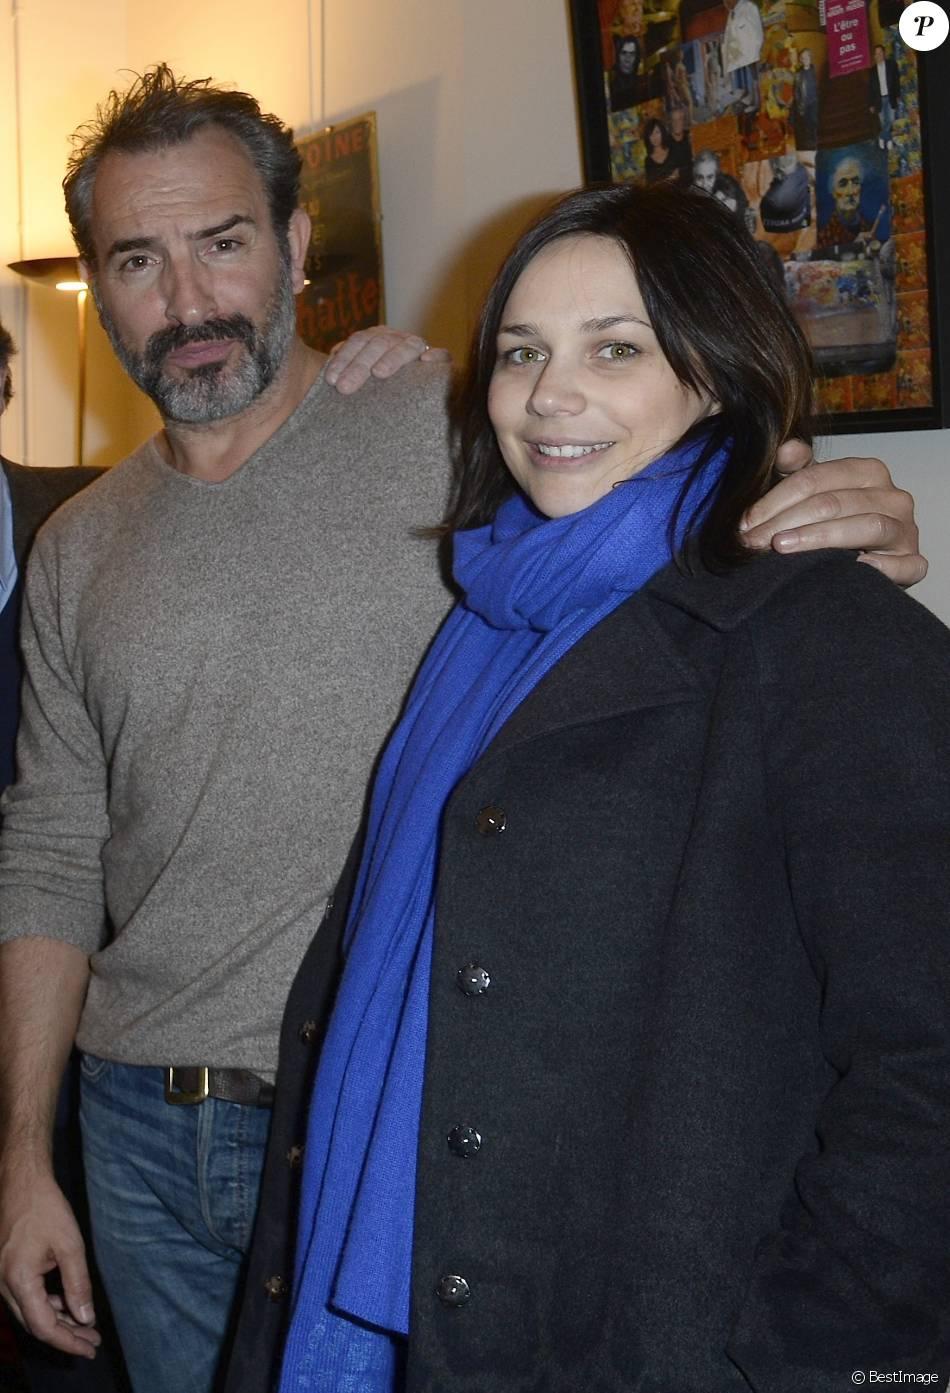 Jean dujardin et sa compagne nathalie p chalat people for Nathalie pechalat et jean dujardin